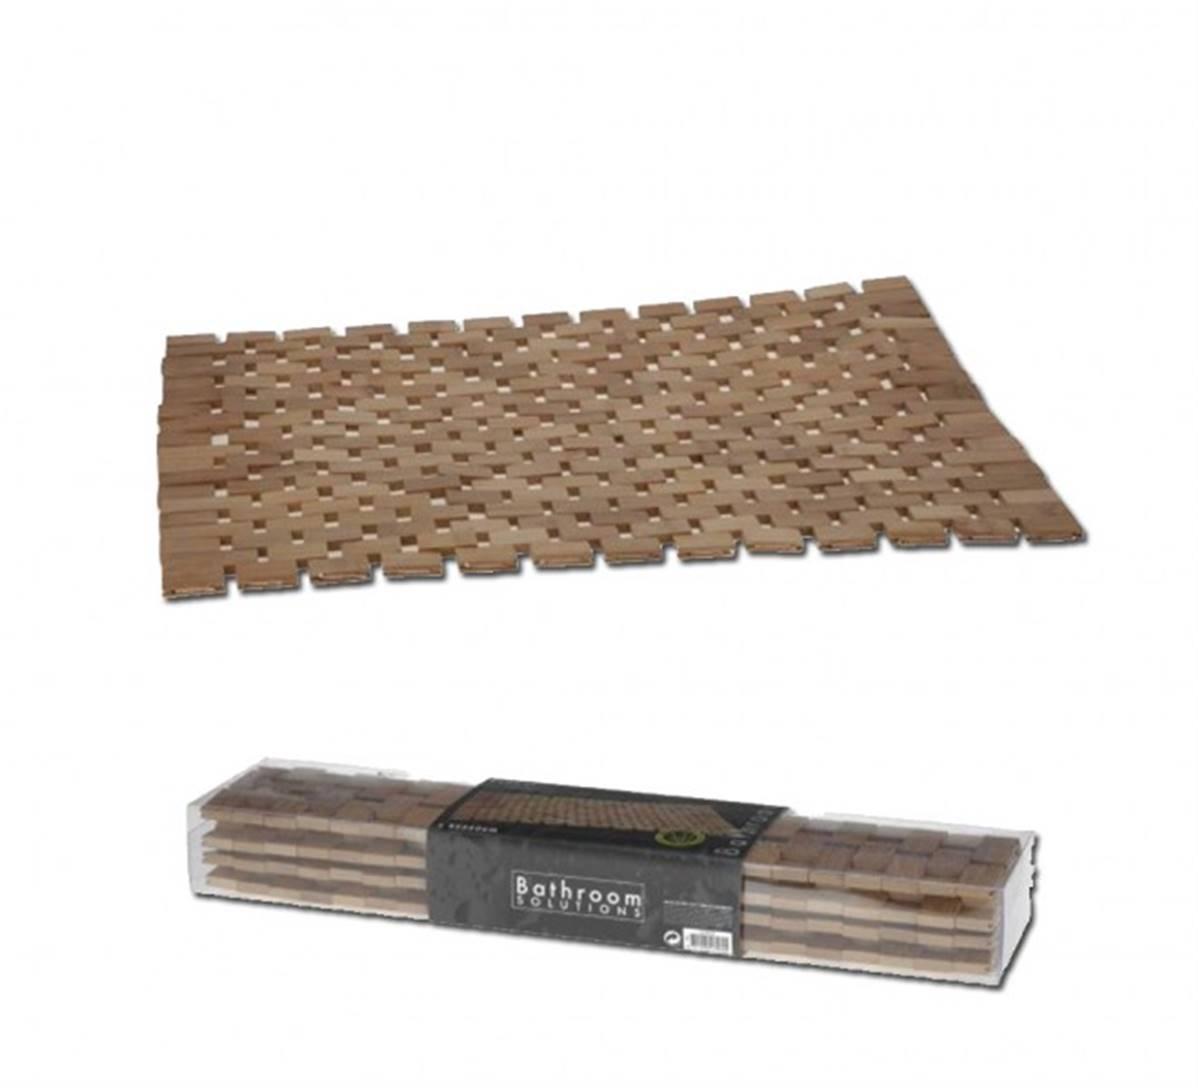 tapis de bain pour douche et baignoire en bambou design